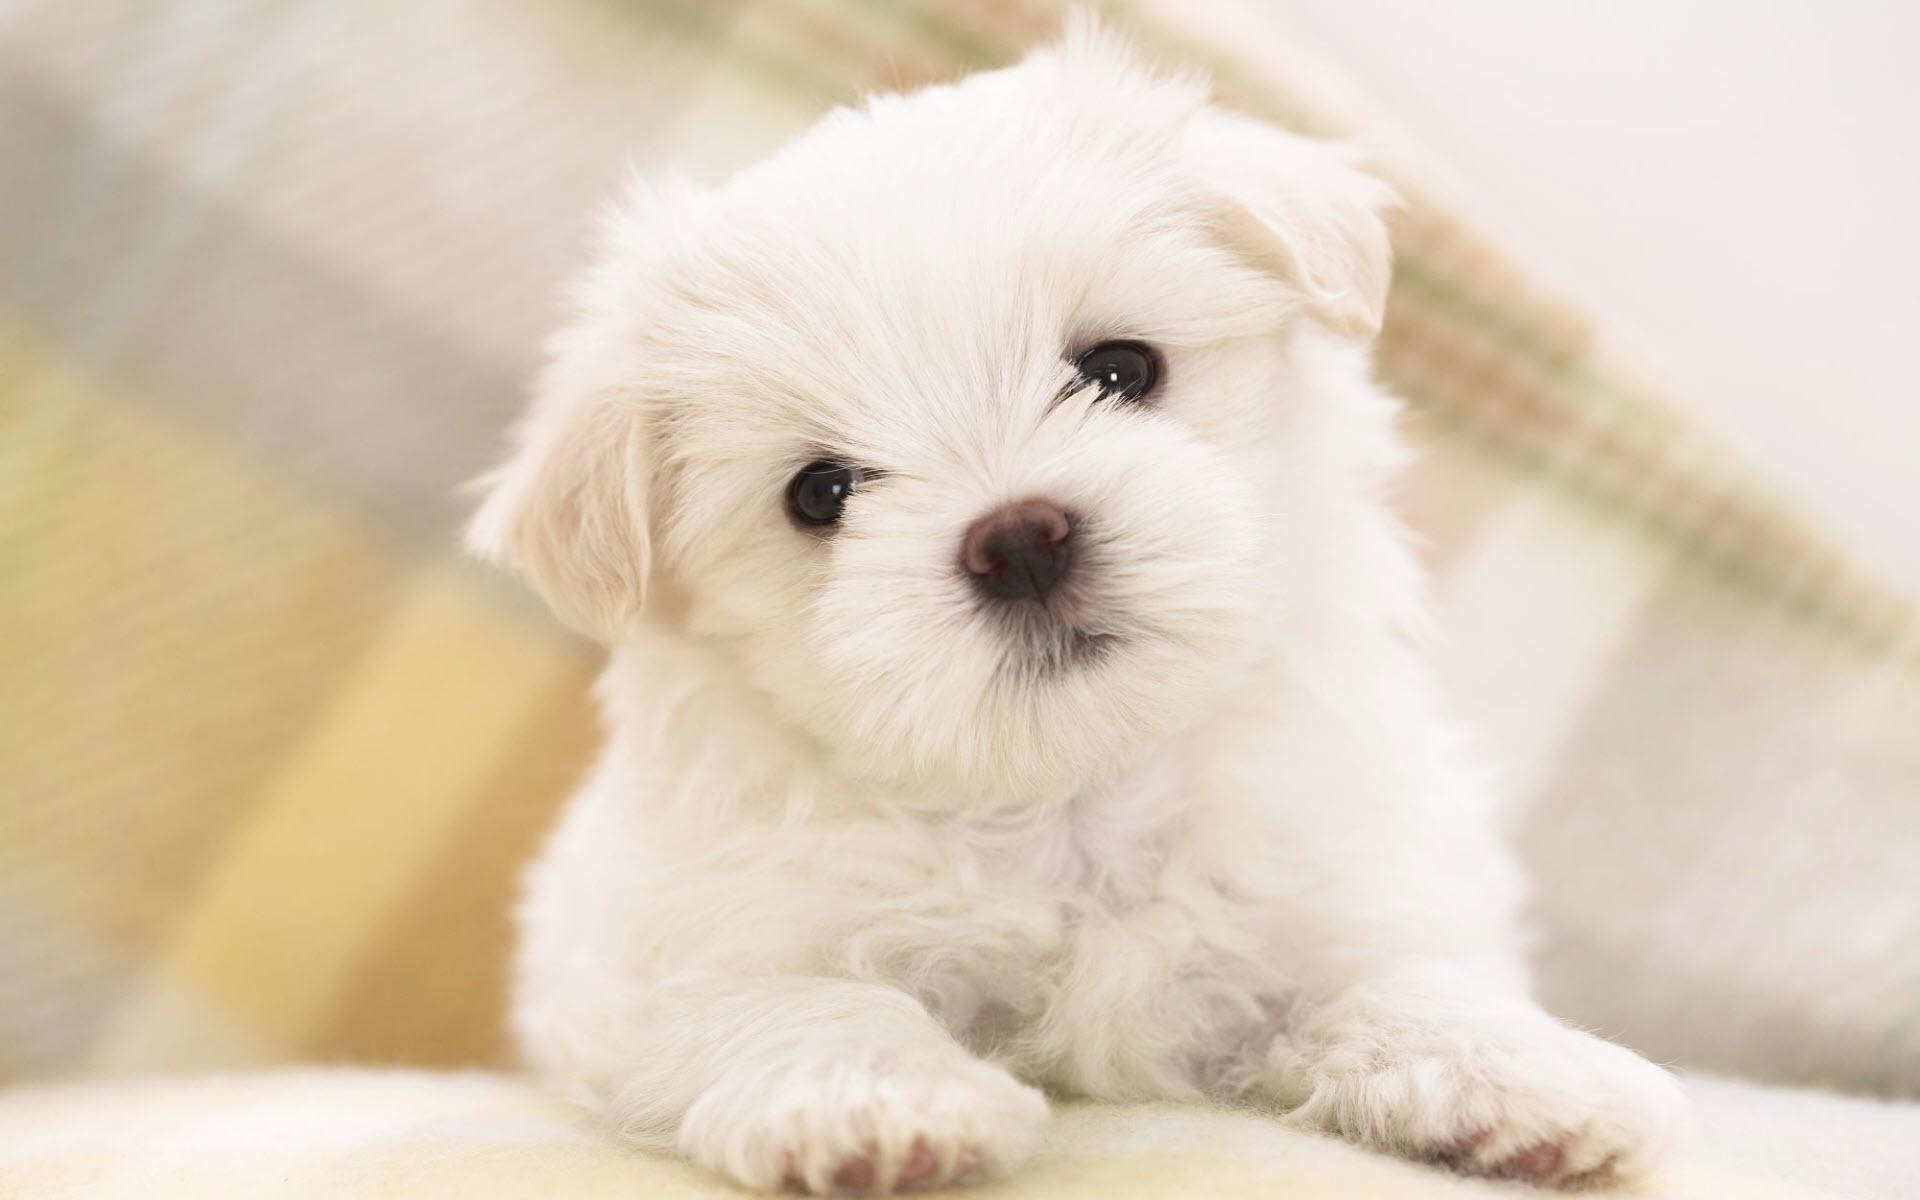 собака щенок dog puppy бесплатно